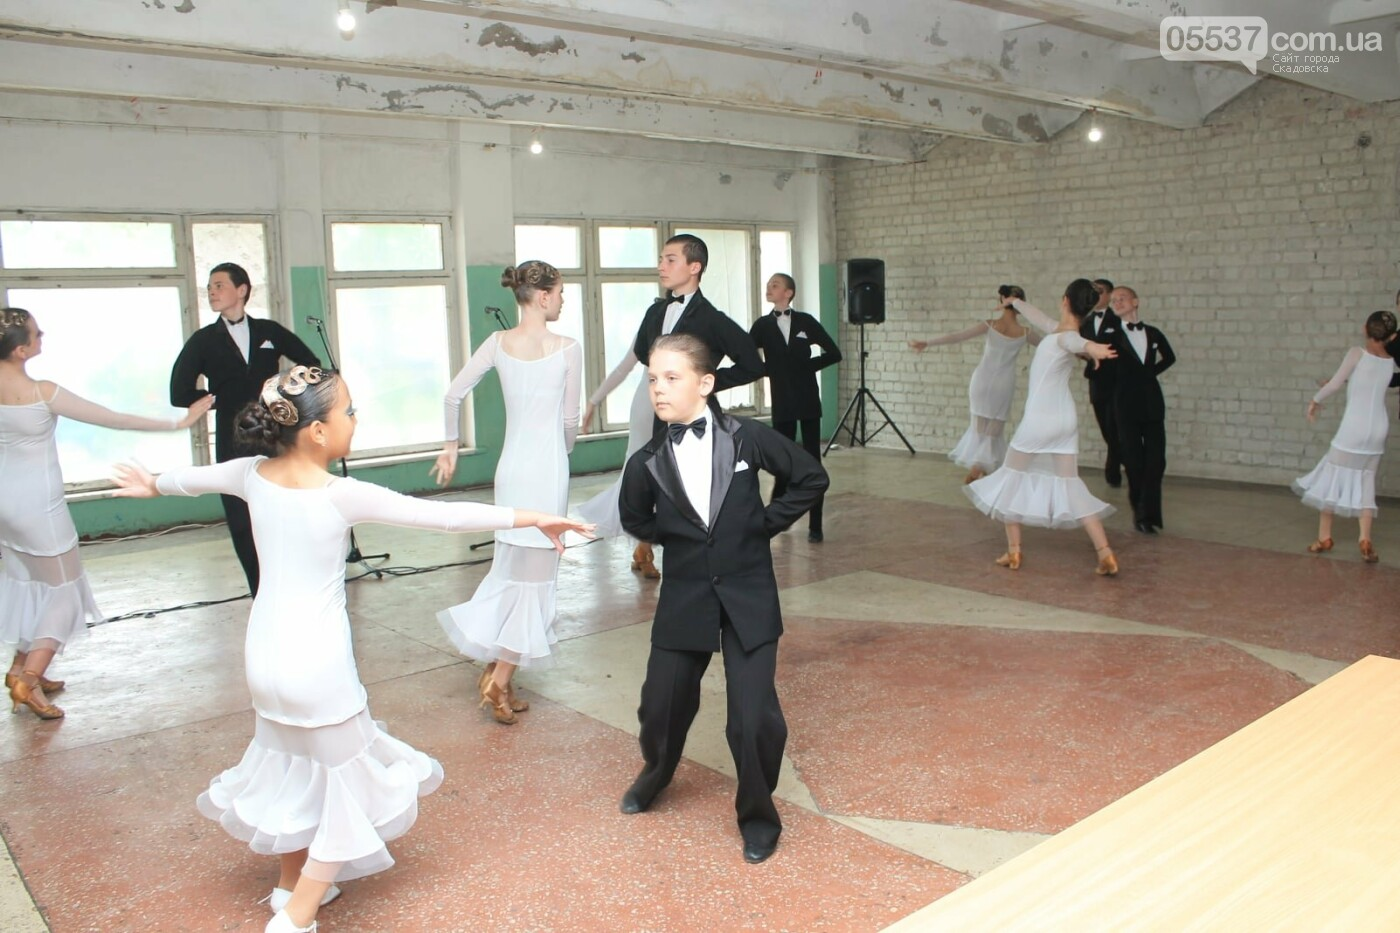 В Скадовском районе морских пехотинцев поздравляли с праздником (ФОТО), фото-4